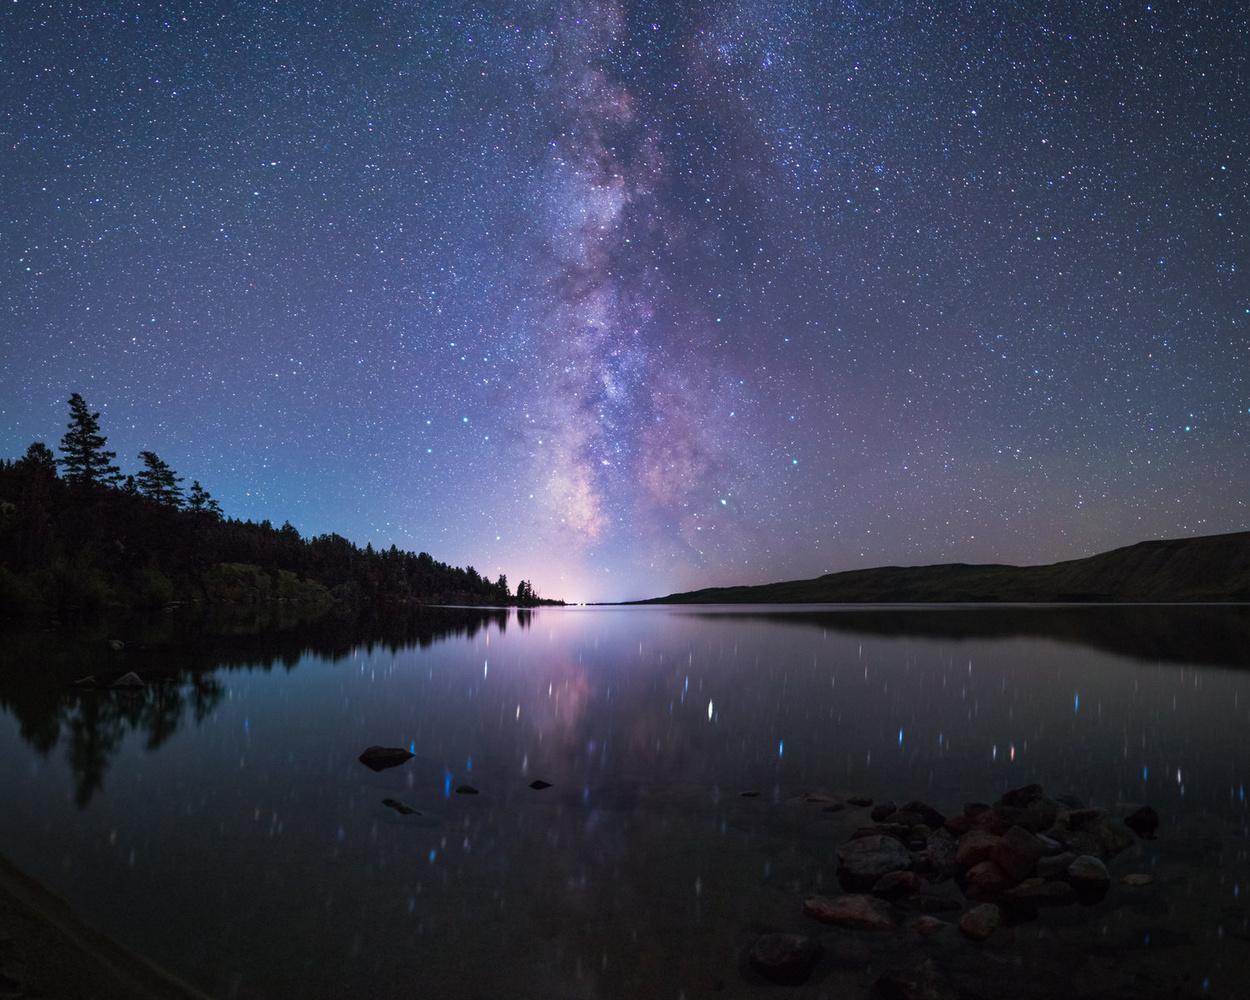 Bridger Teton Milky Way by JT Blenker